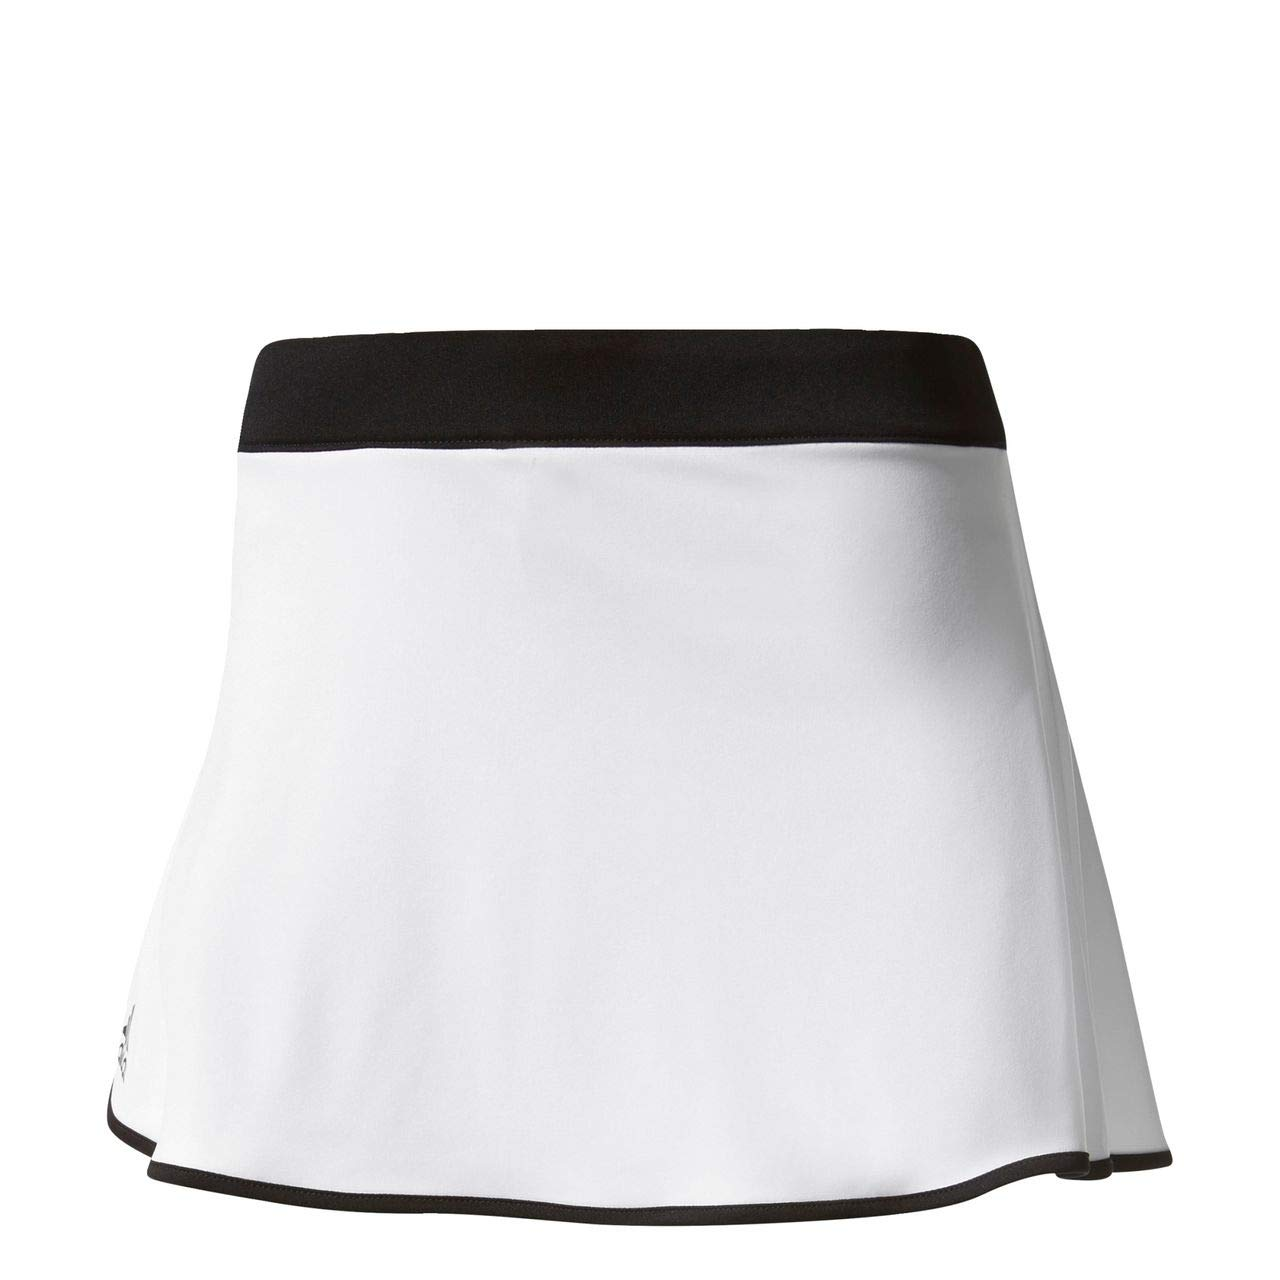 adidas Aspire Skort Falda de Tenis, Mujer, Negro/Blanco, 2XS ...